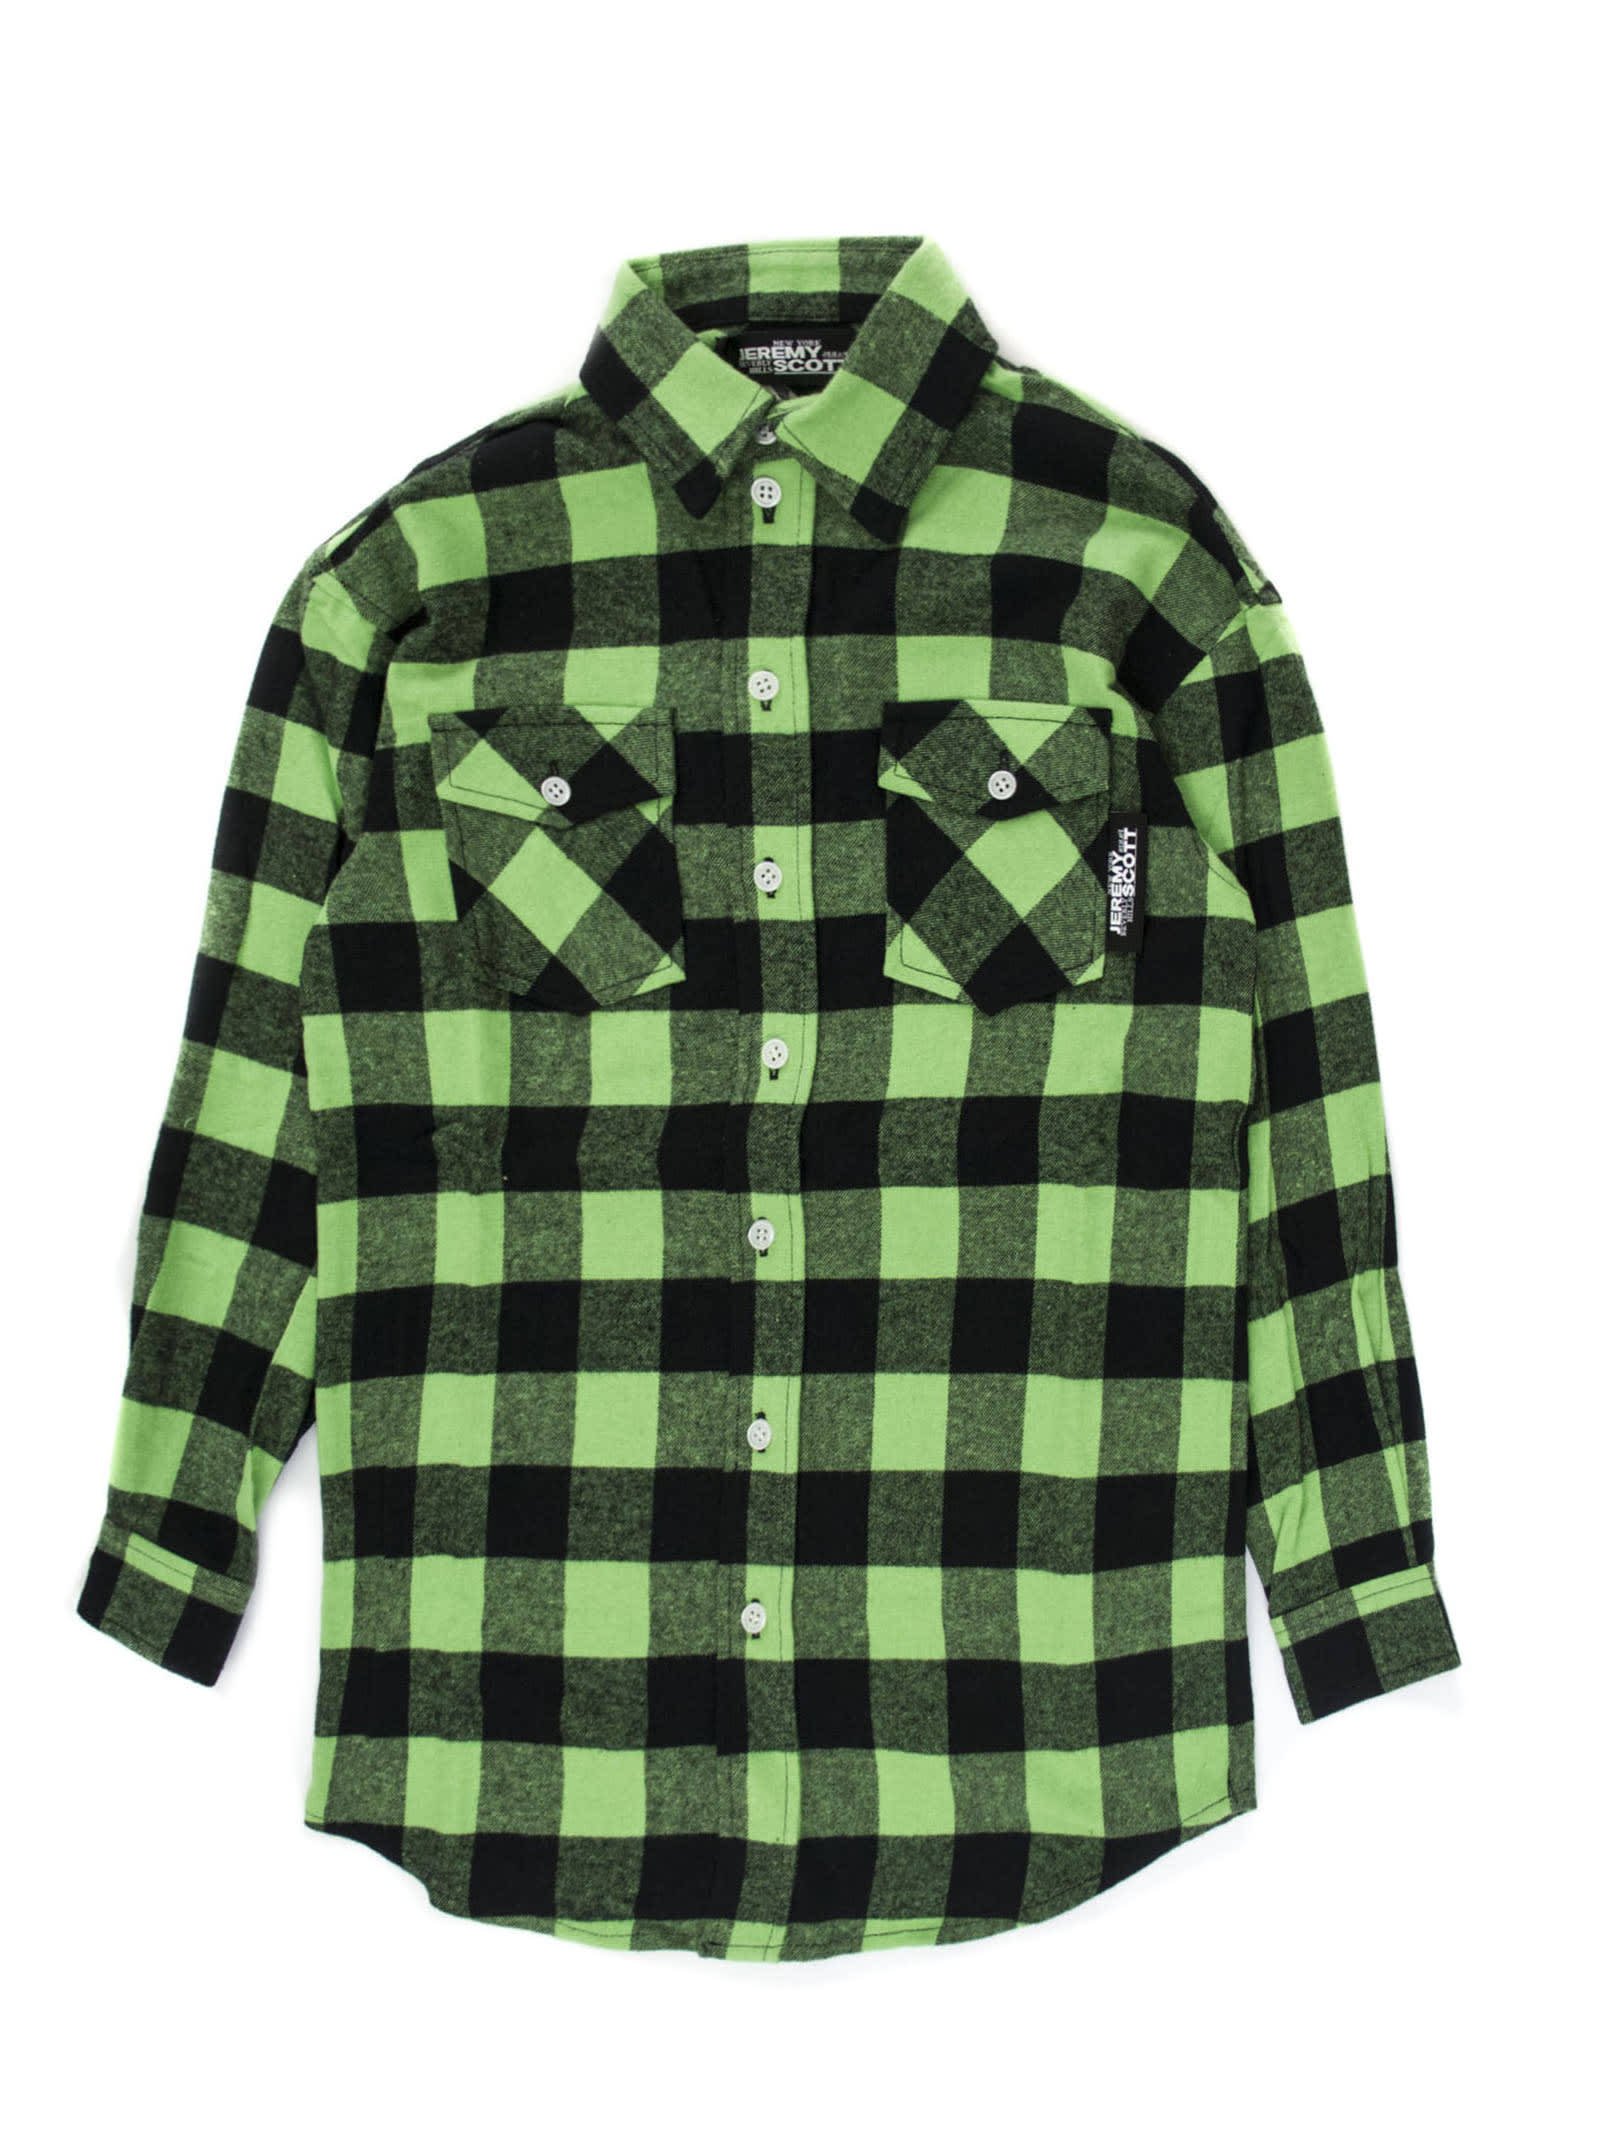 Black And Green Checked Shirt